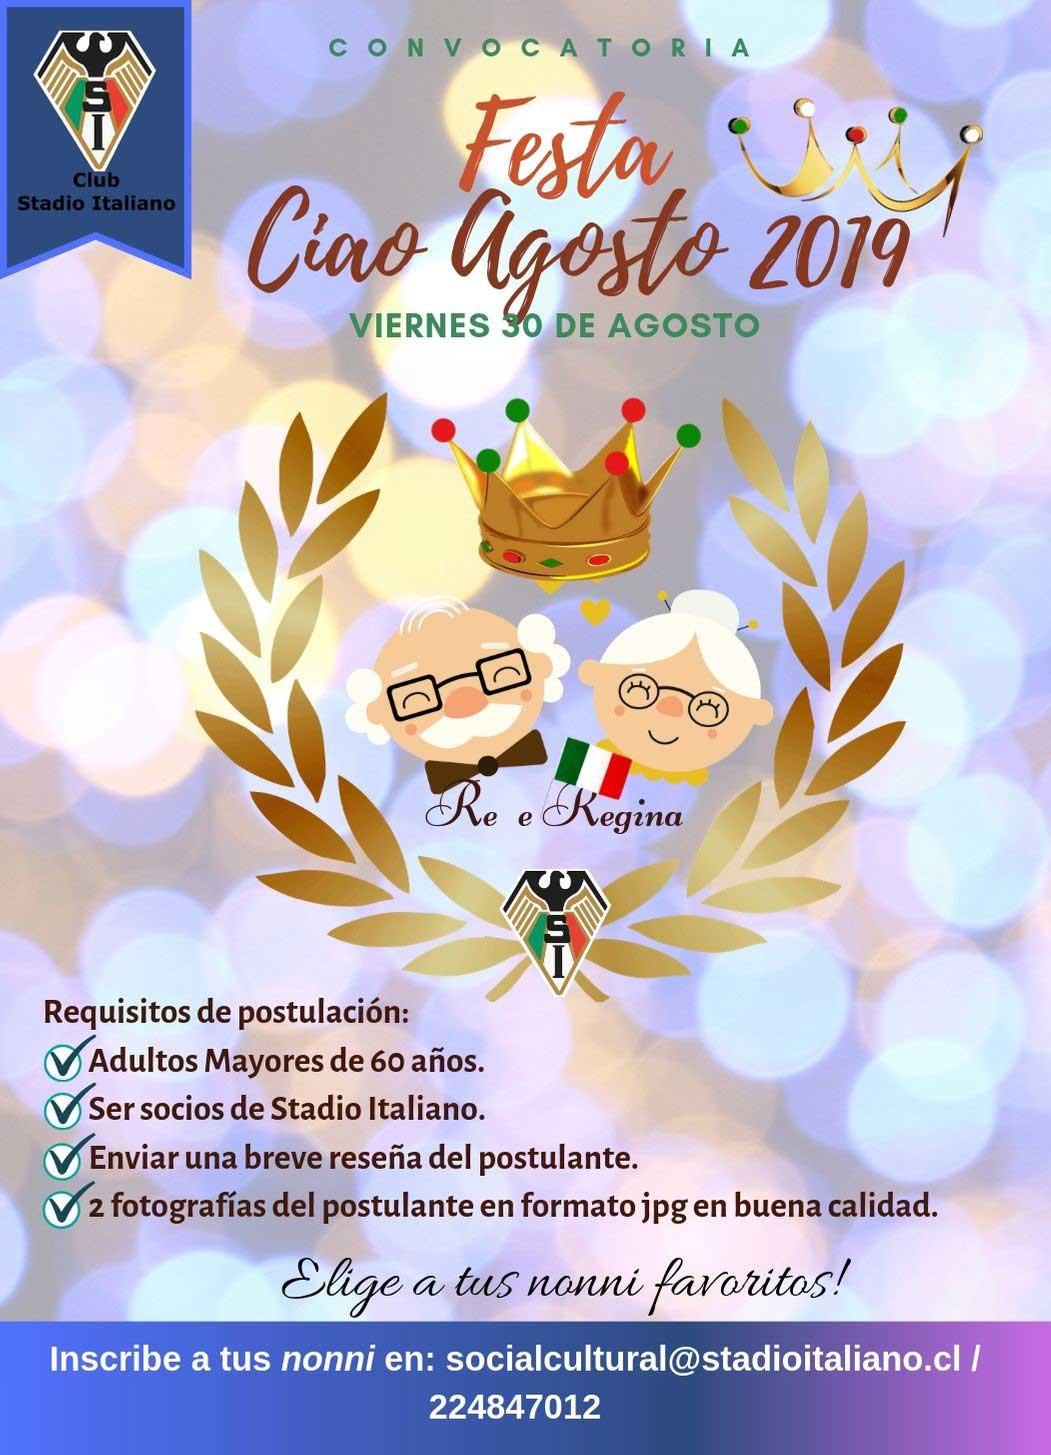 Ciao-Agosto-2019_fb_op